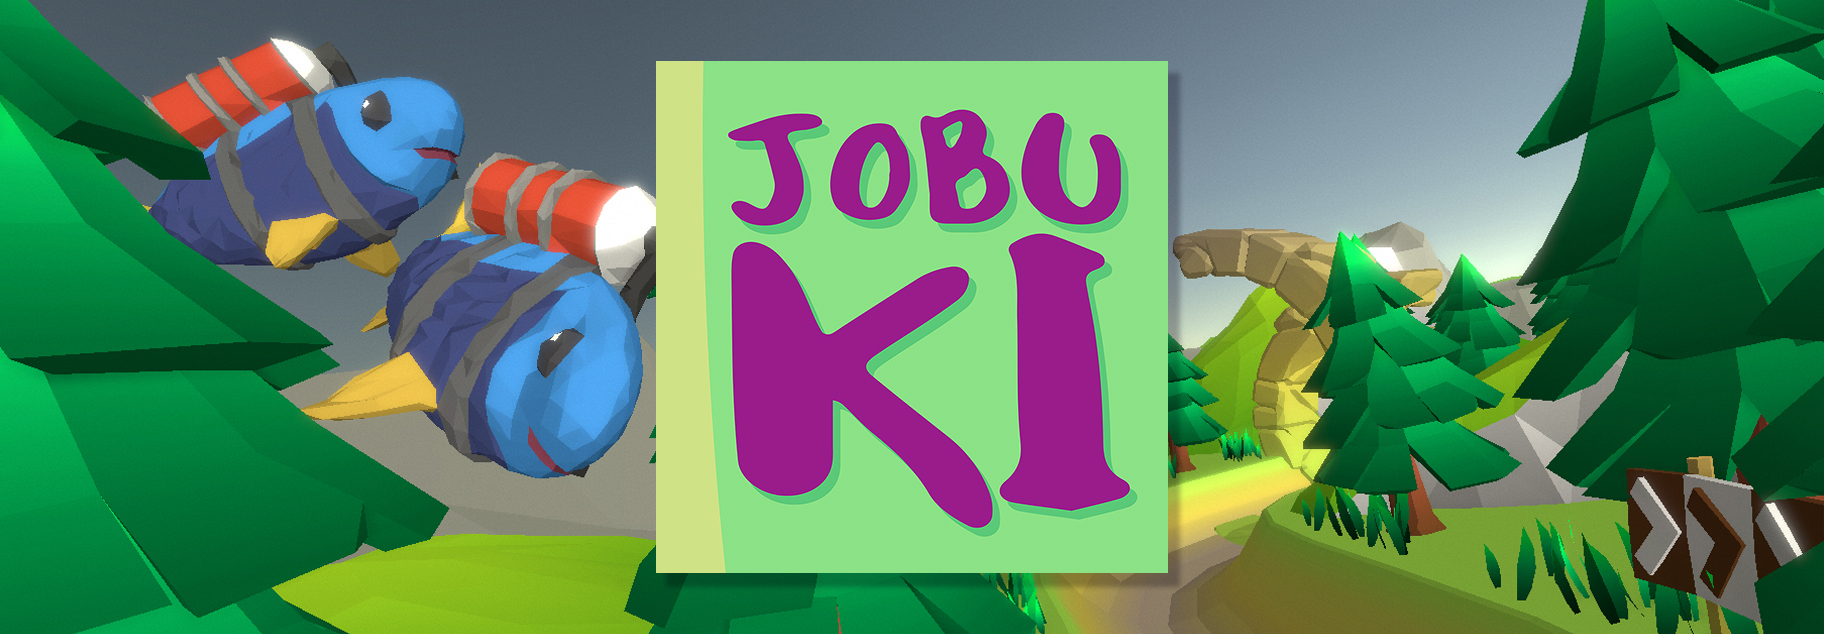 JOBU-KI